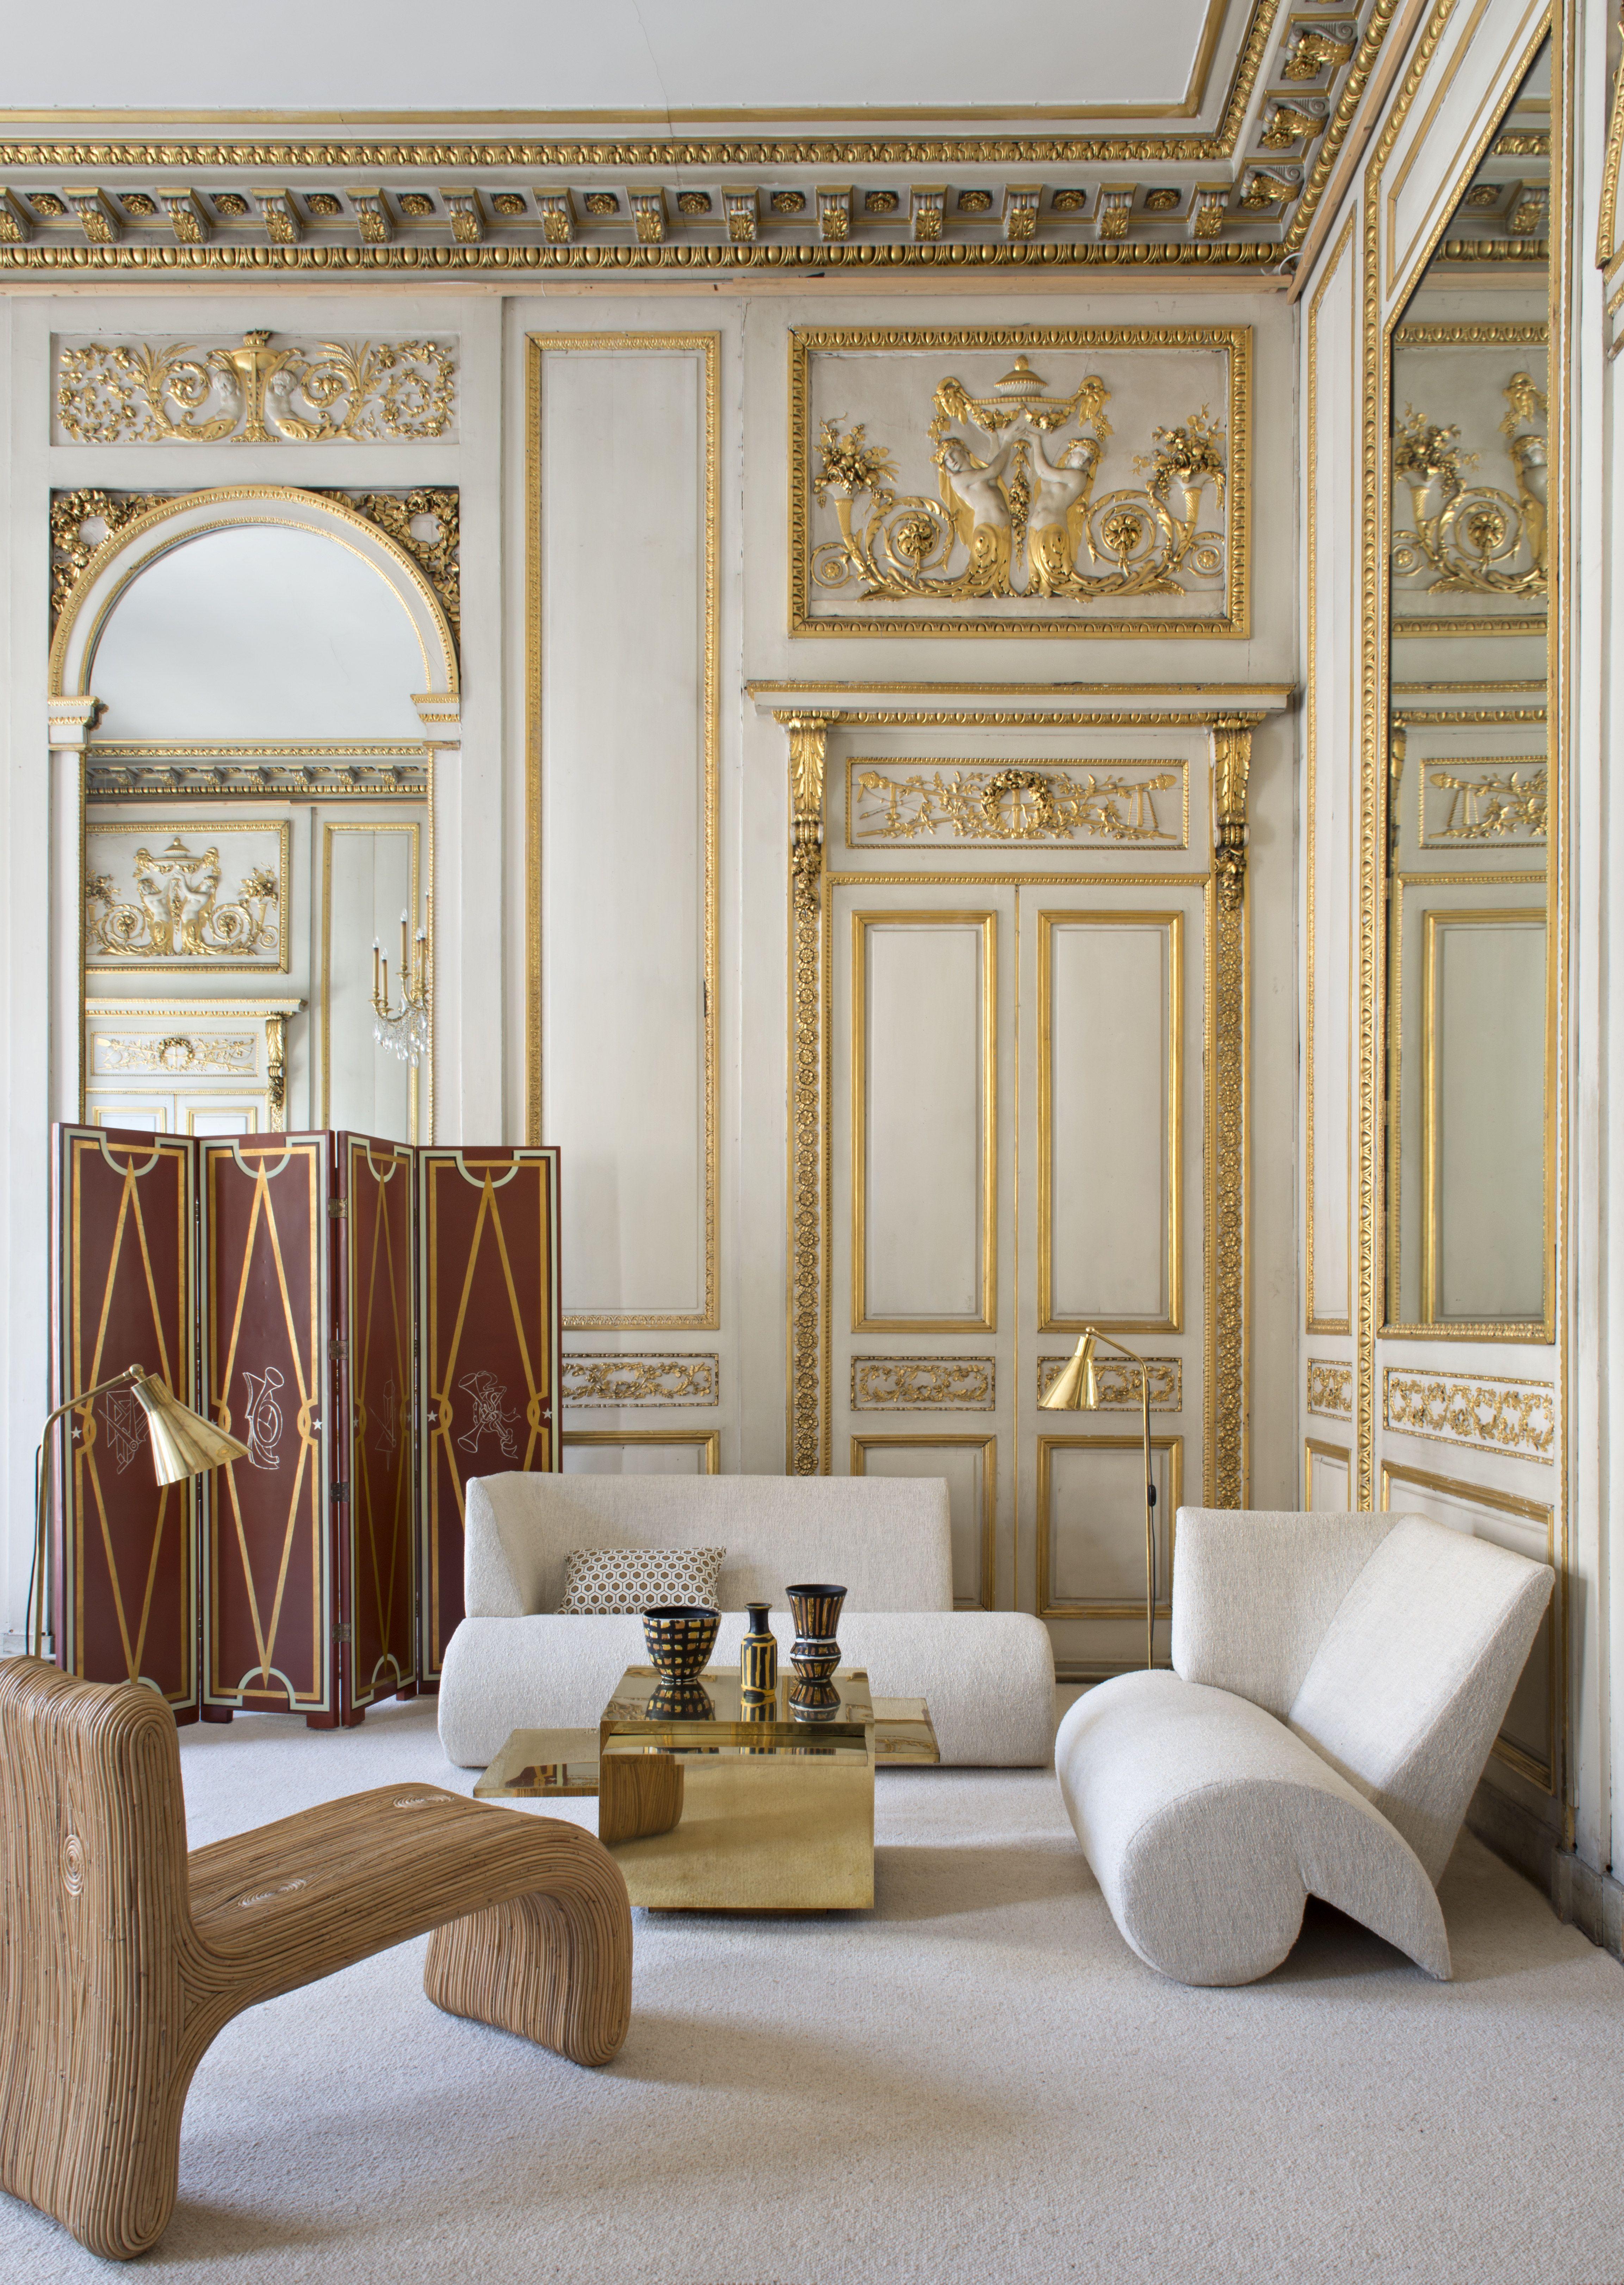 Wohndesign innenraum paris guide  paris shopping art architecture  bunte welt